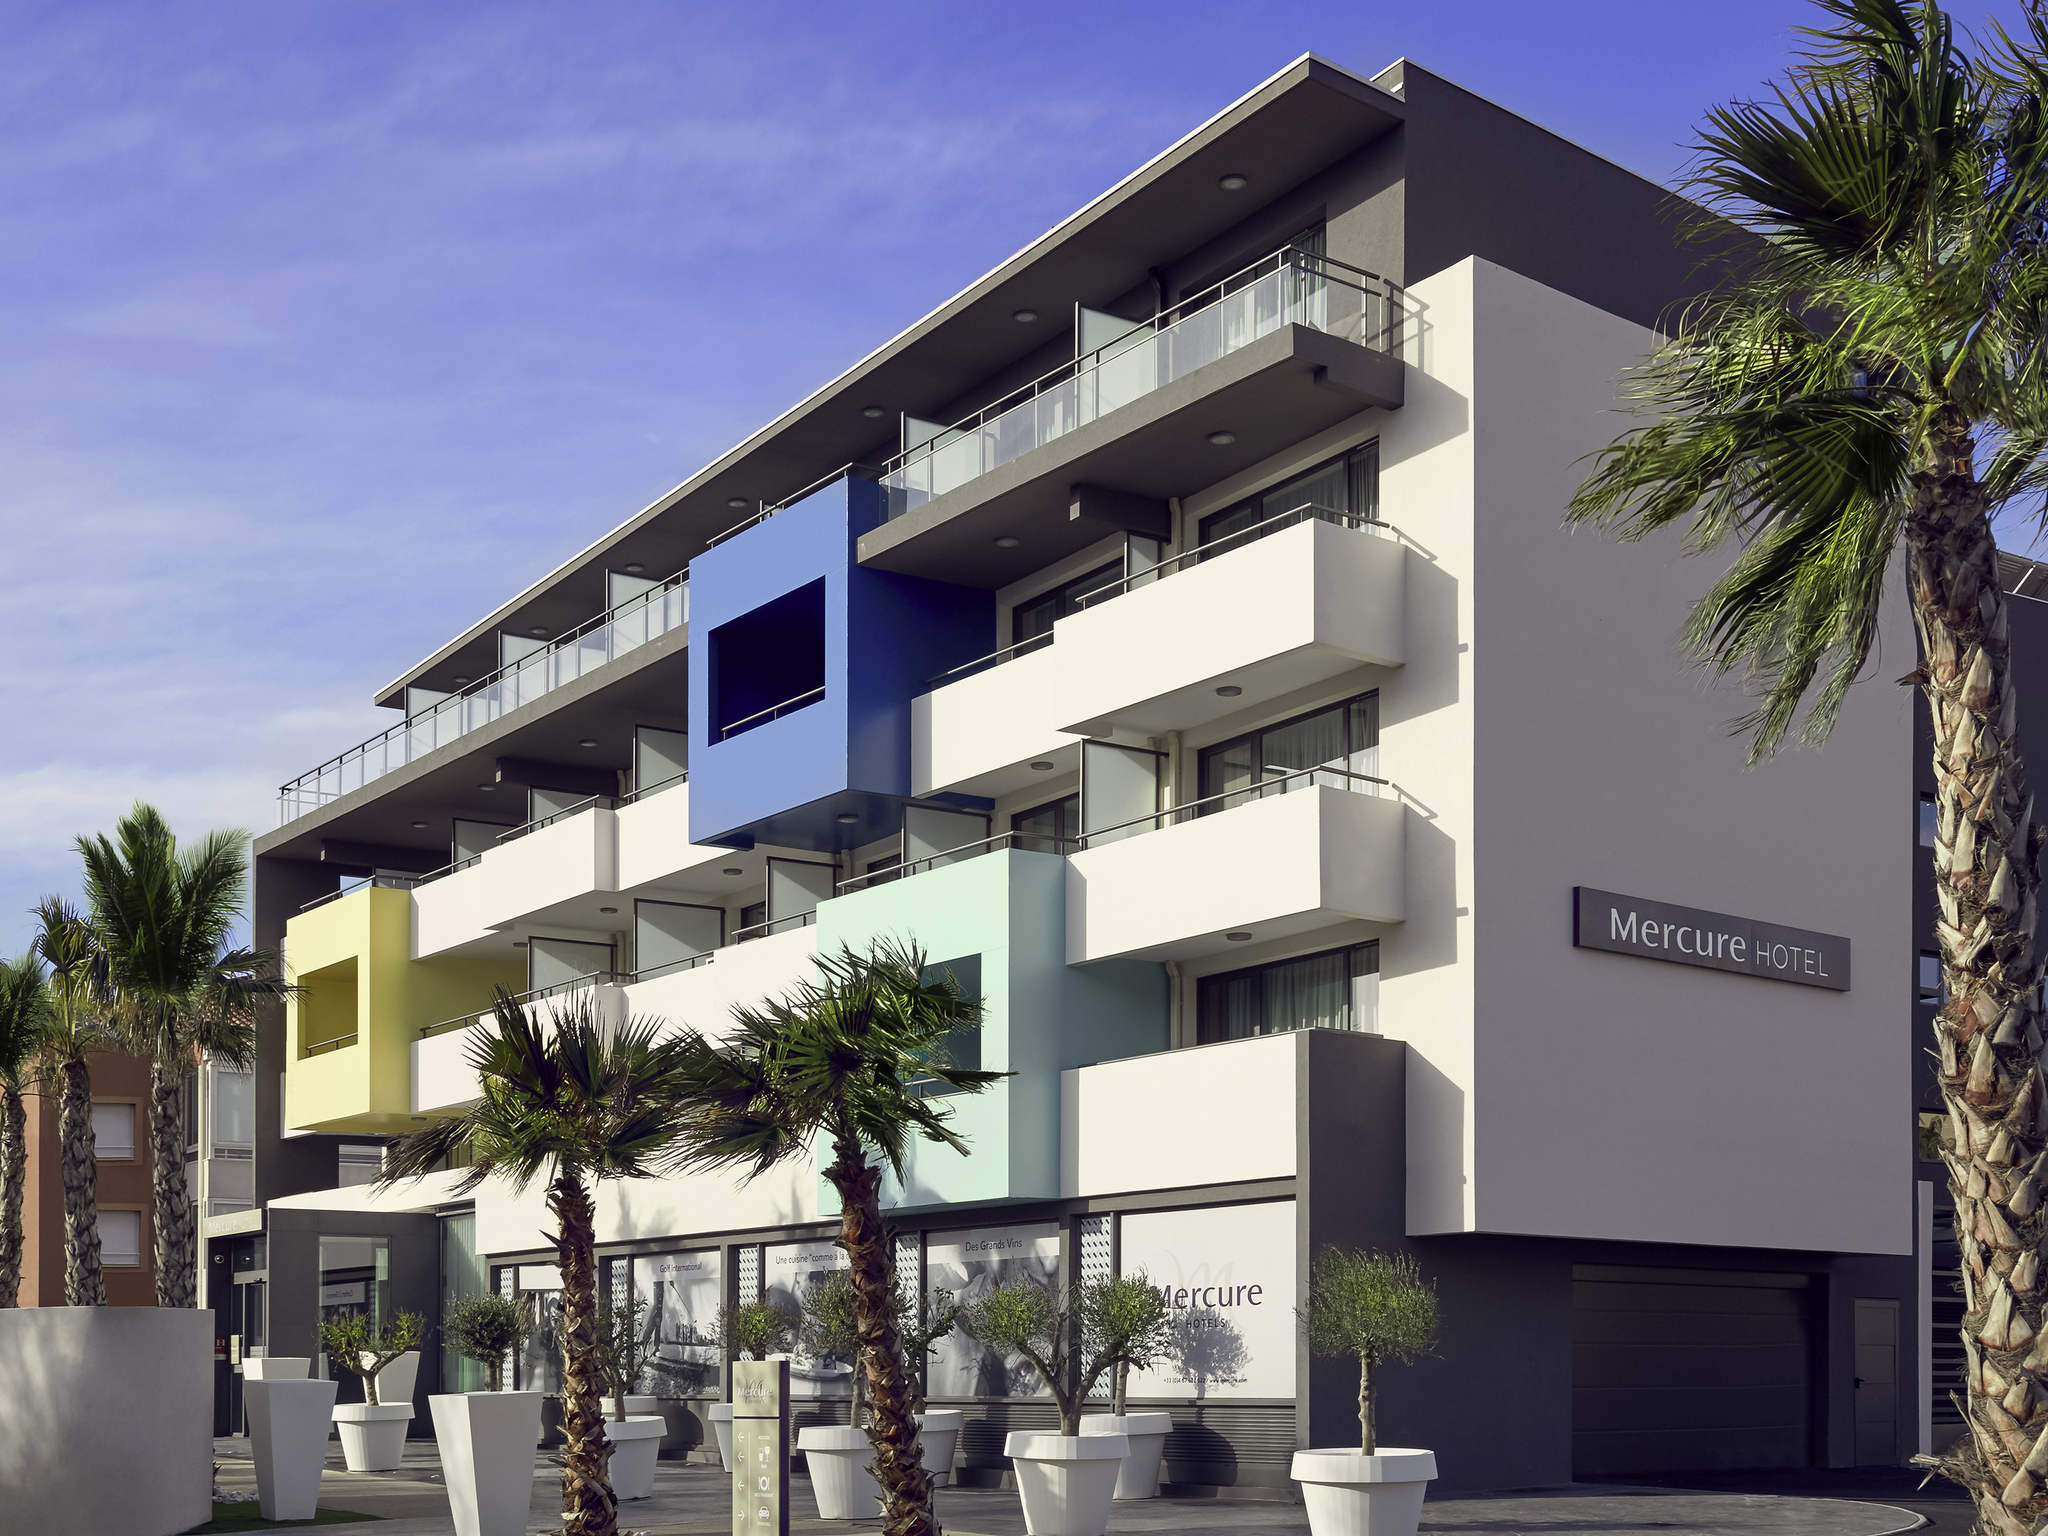 ホテル – Hôtel Mercure Golf Cap d'Agde